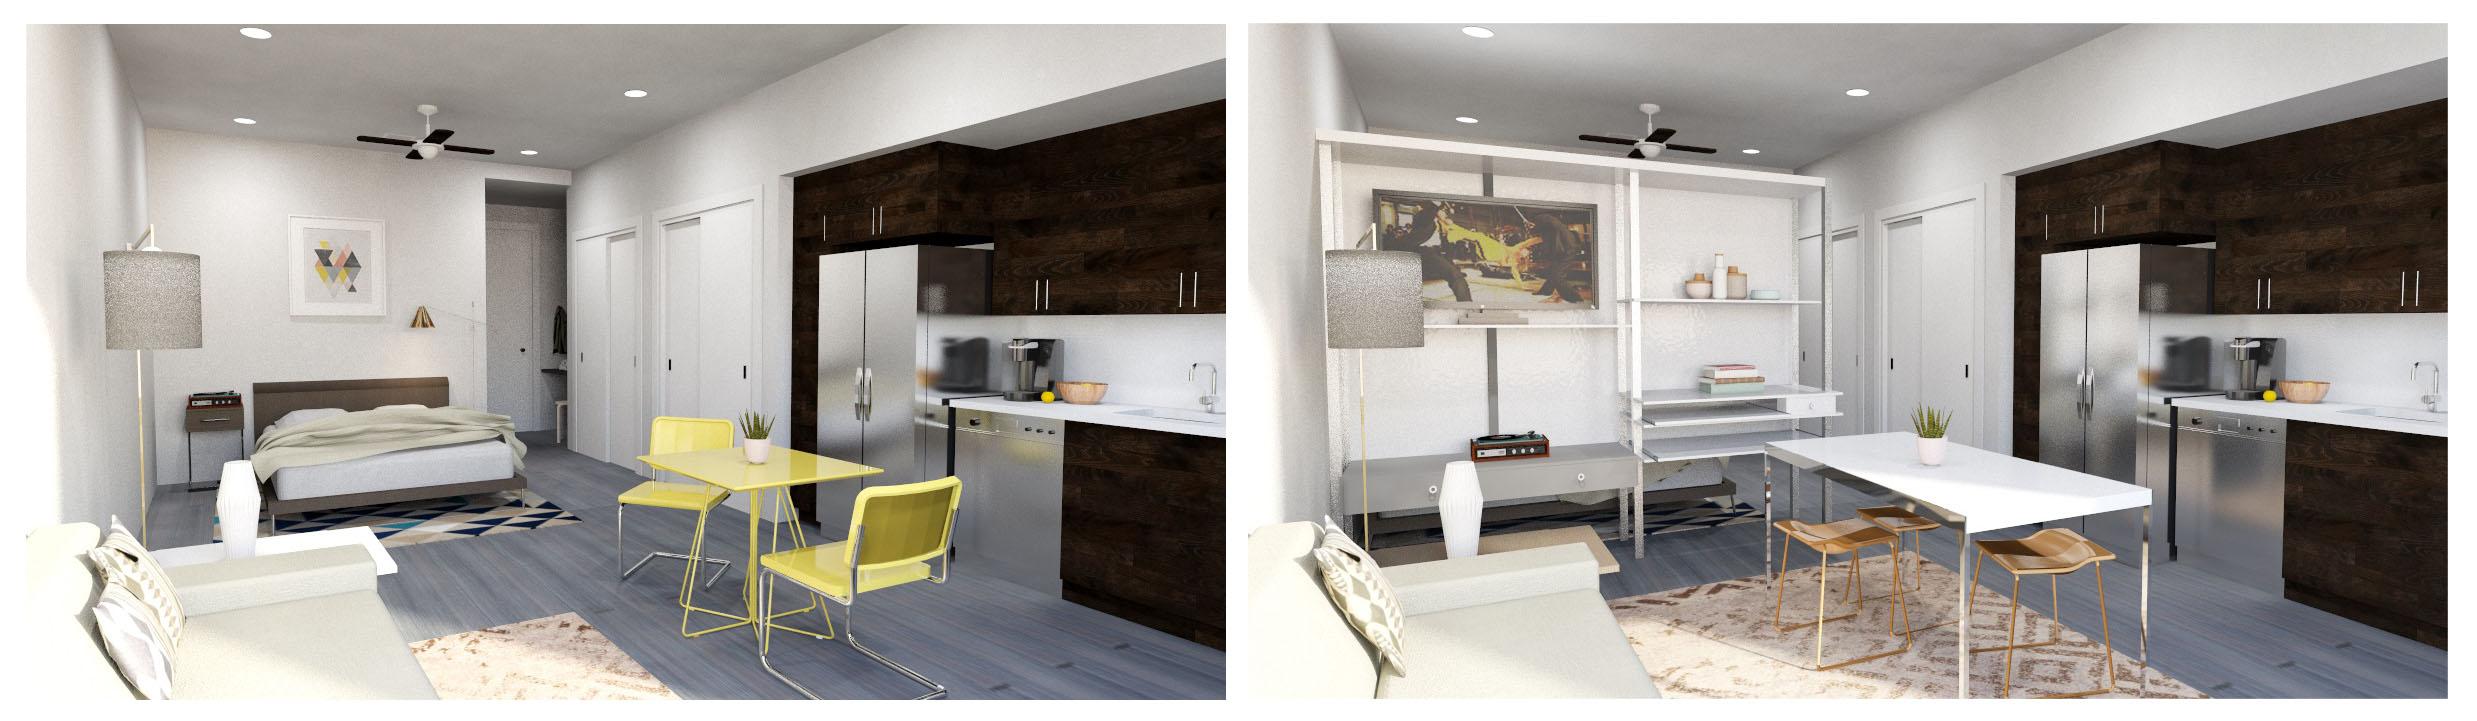 interior units 1.jpg